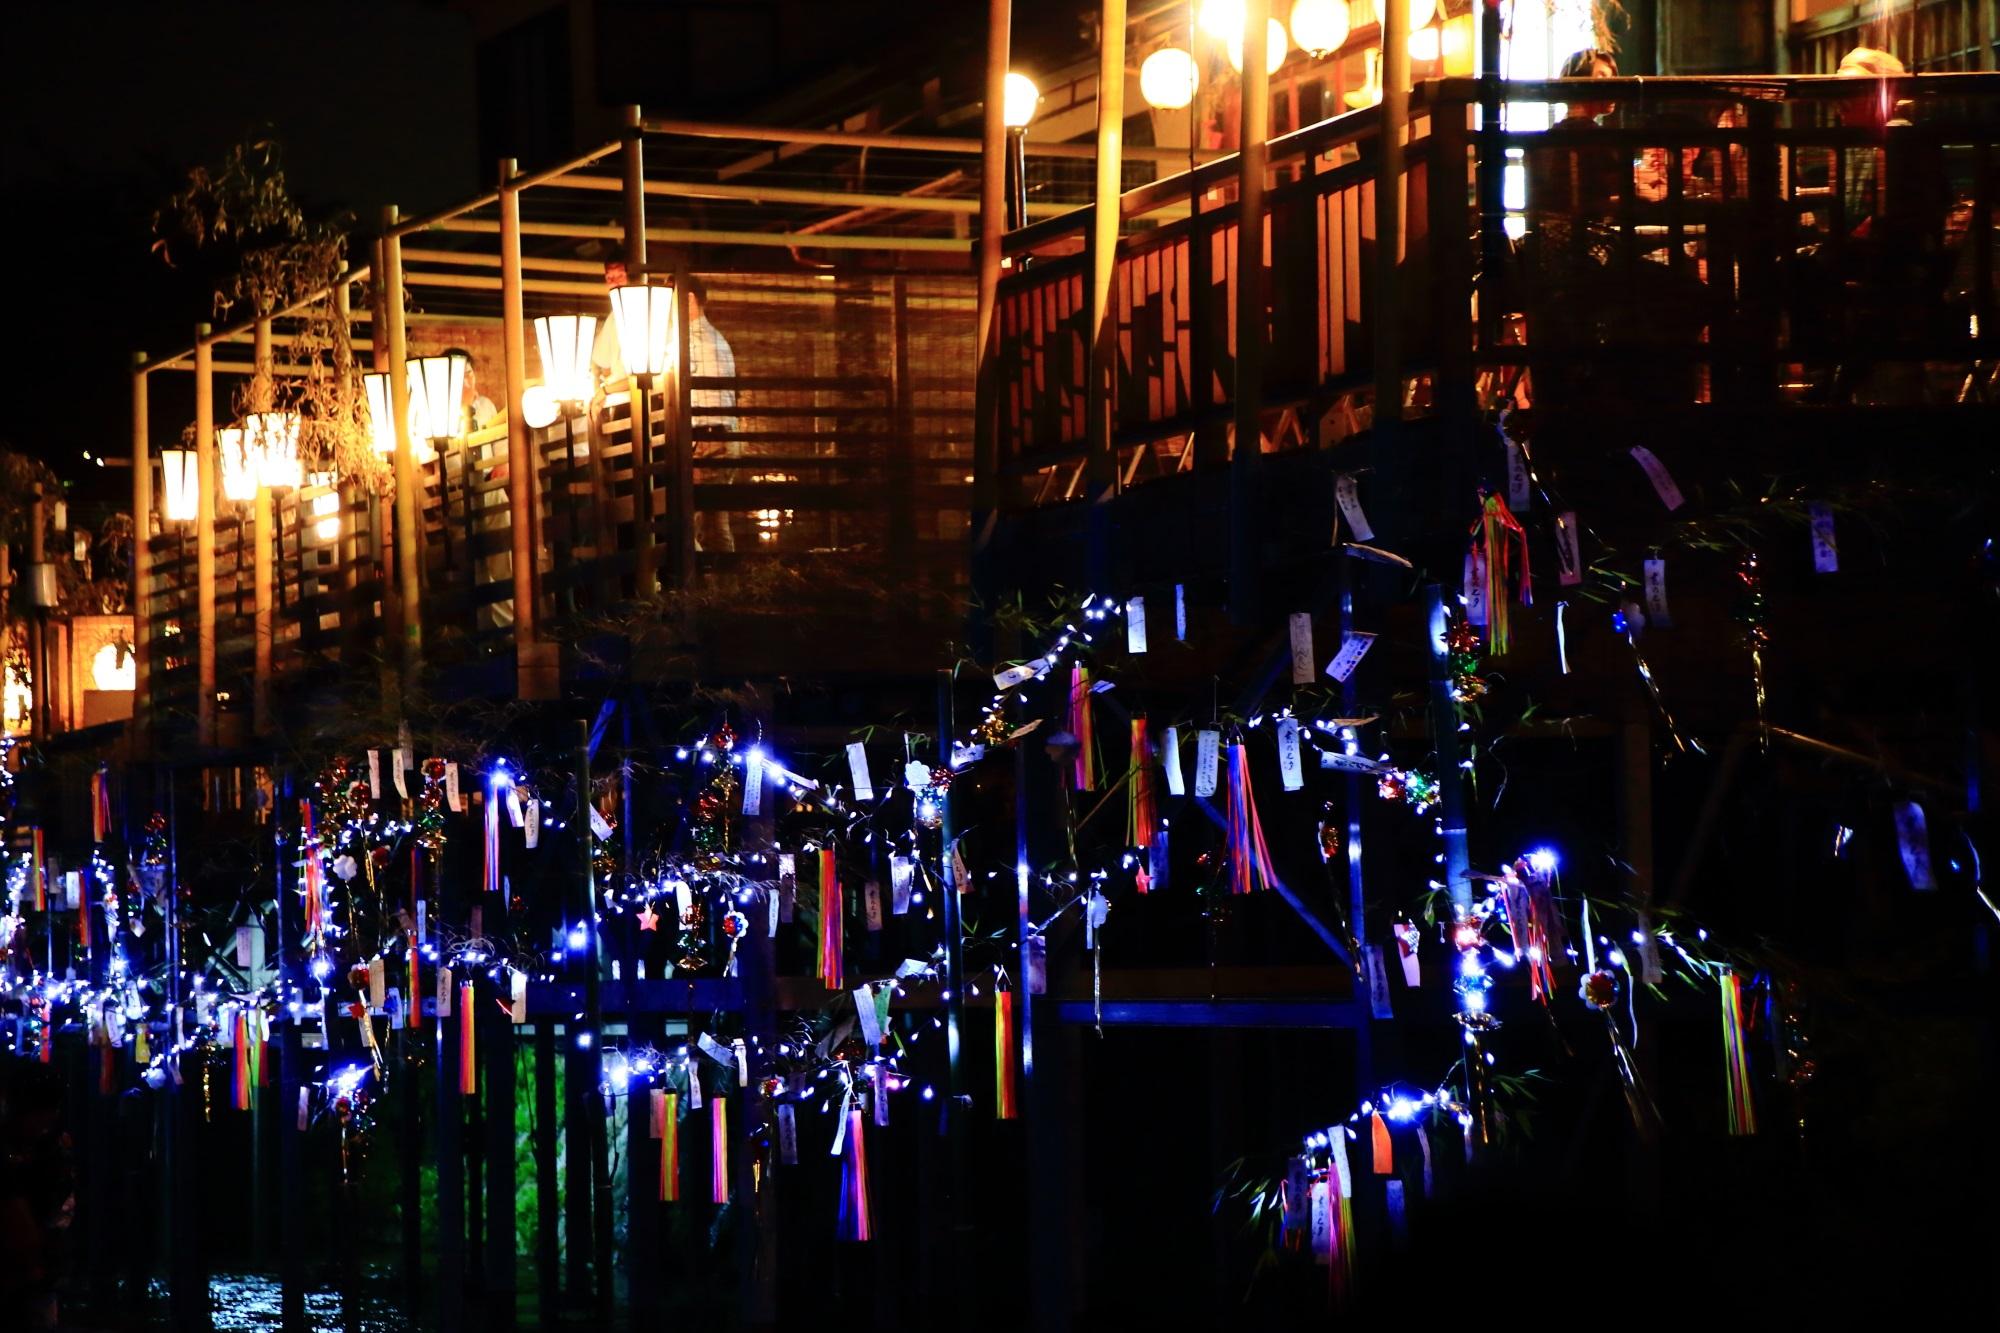 納涼床 大笹飾り 京の七夕 鴨川